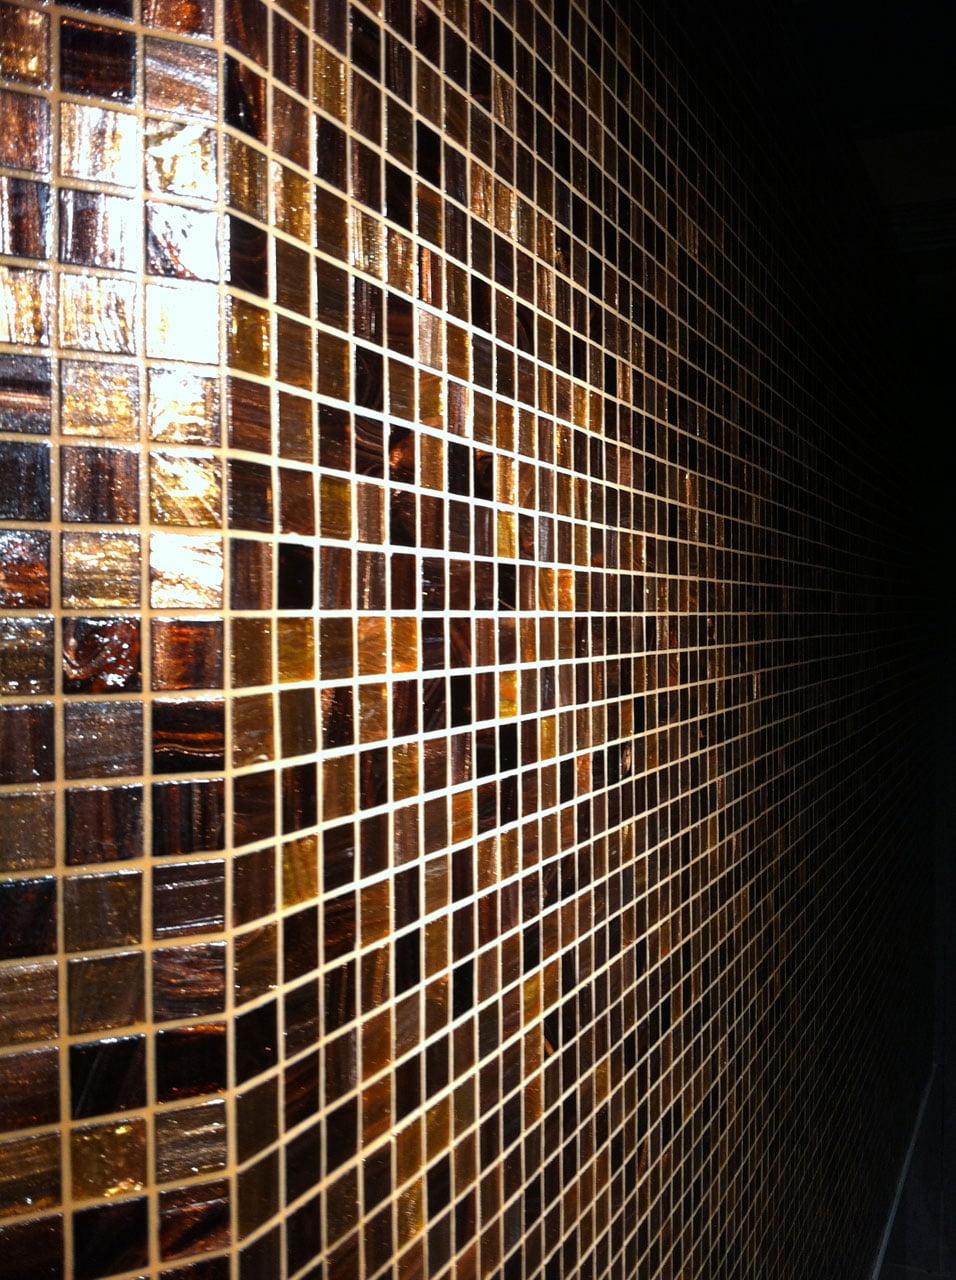 Wand mit braunem Glasmosaik